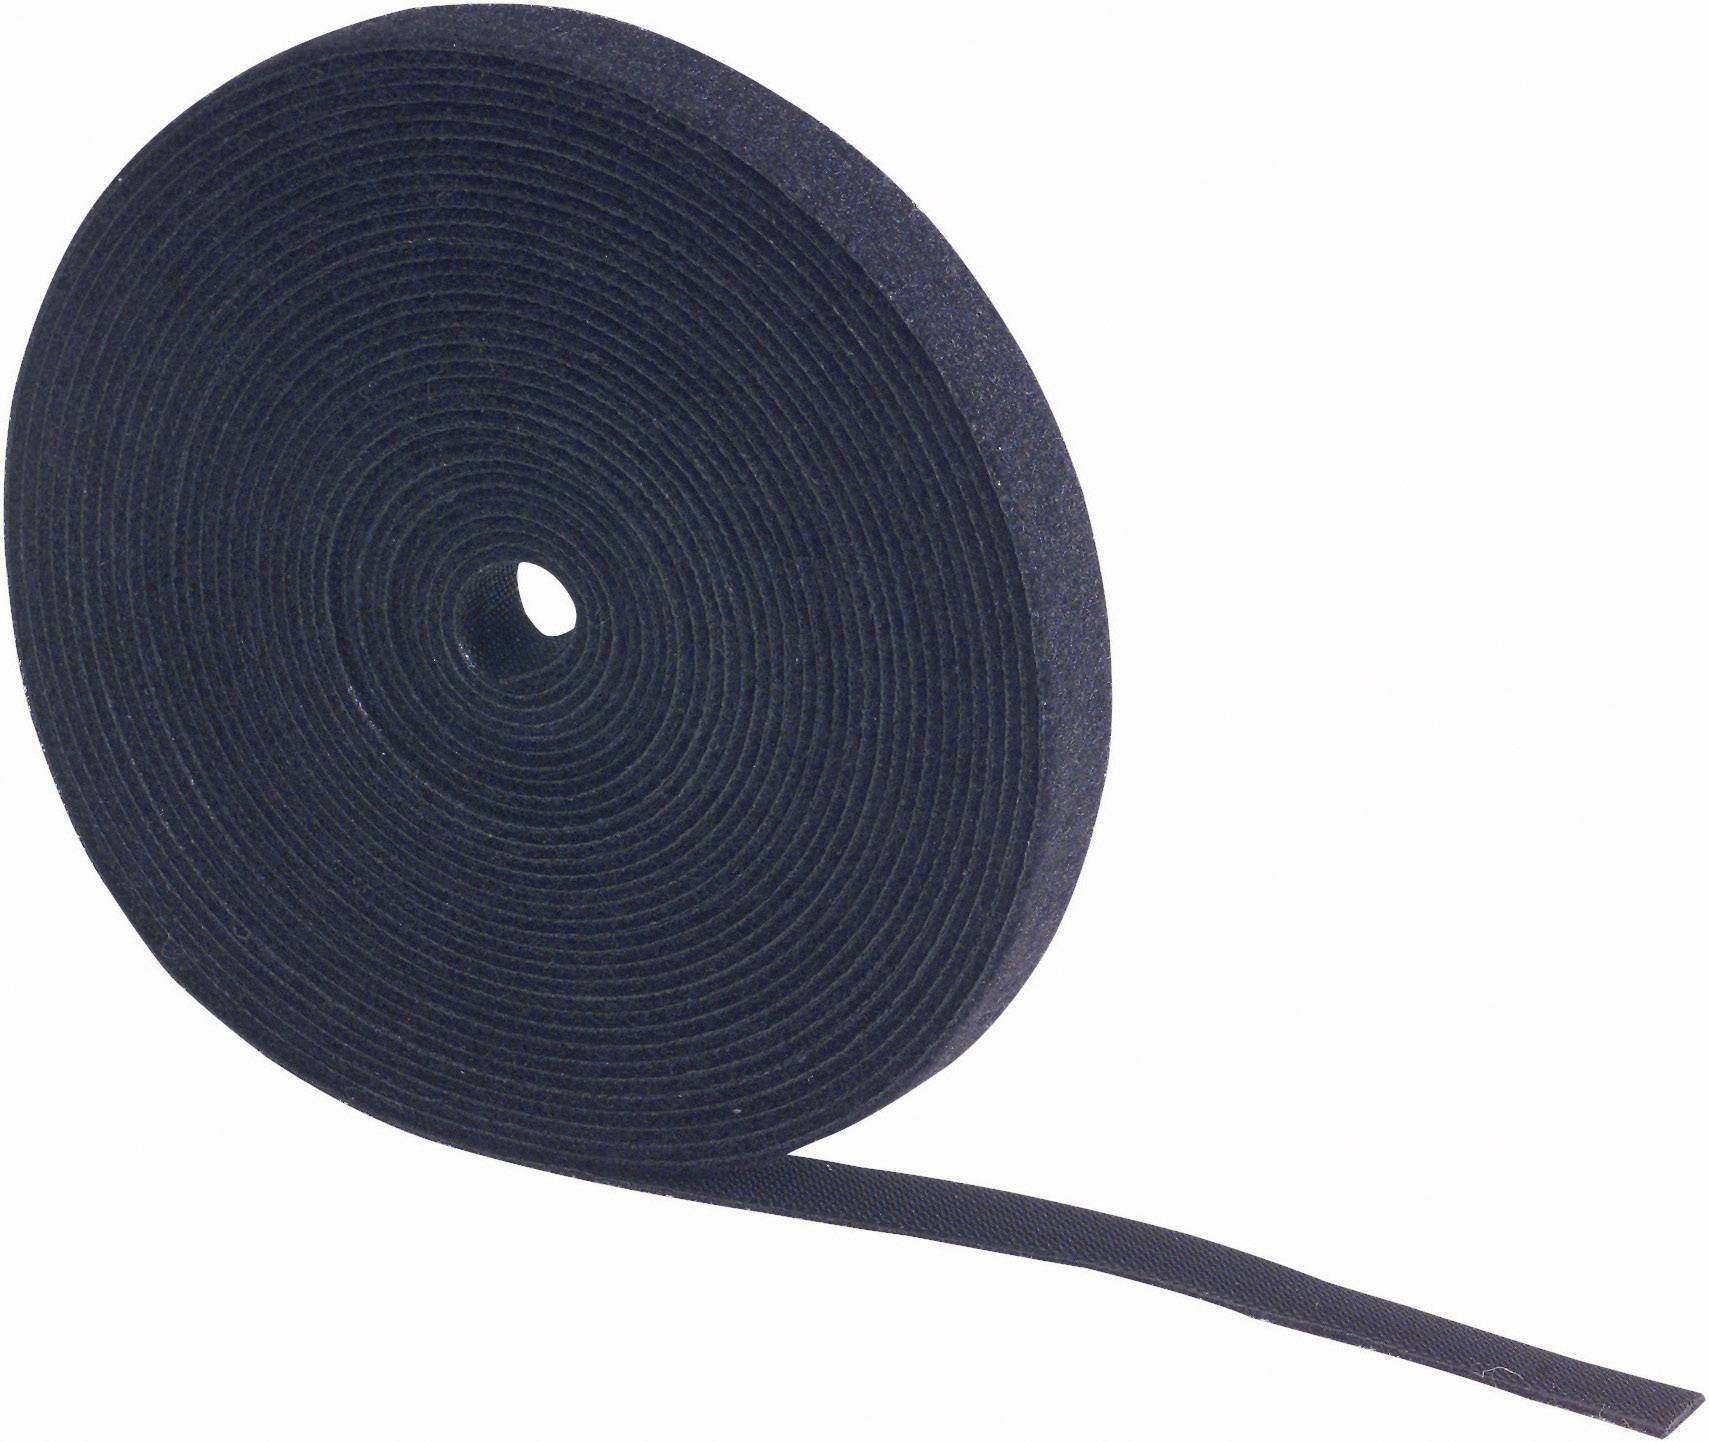 Páska se suchým zipem, Fastech 910-650C, zelená, 1 m x 20 mm